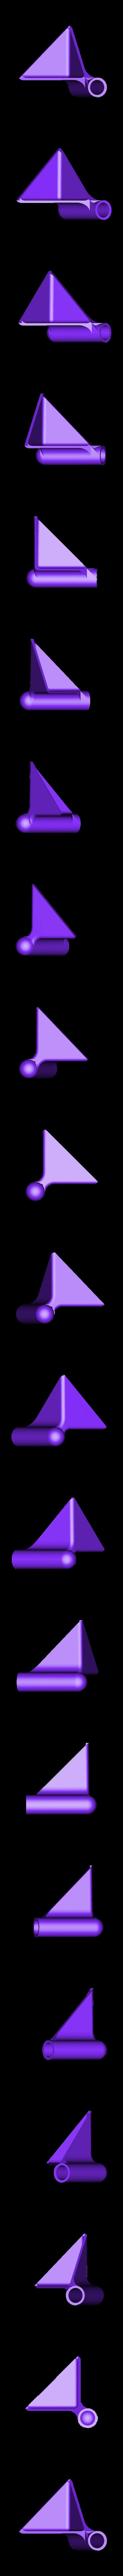 raccord angle 90 pied.stl Download free STL file Pipe brackets dia 12 • 3D printing model, mk25